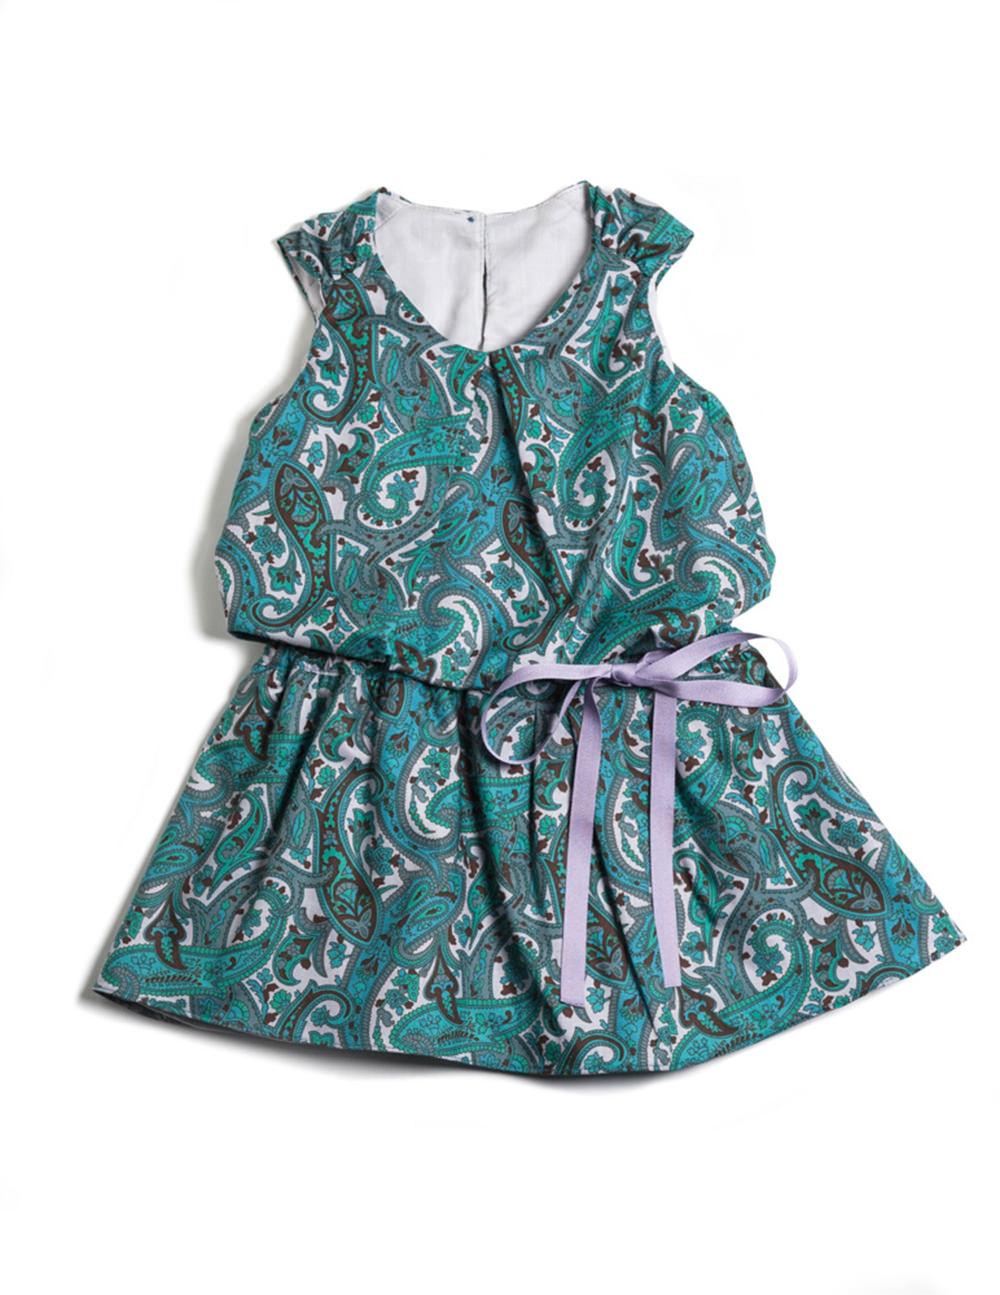 Clothing1_mini.jpg